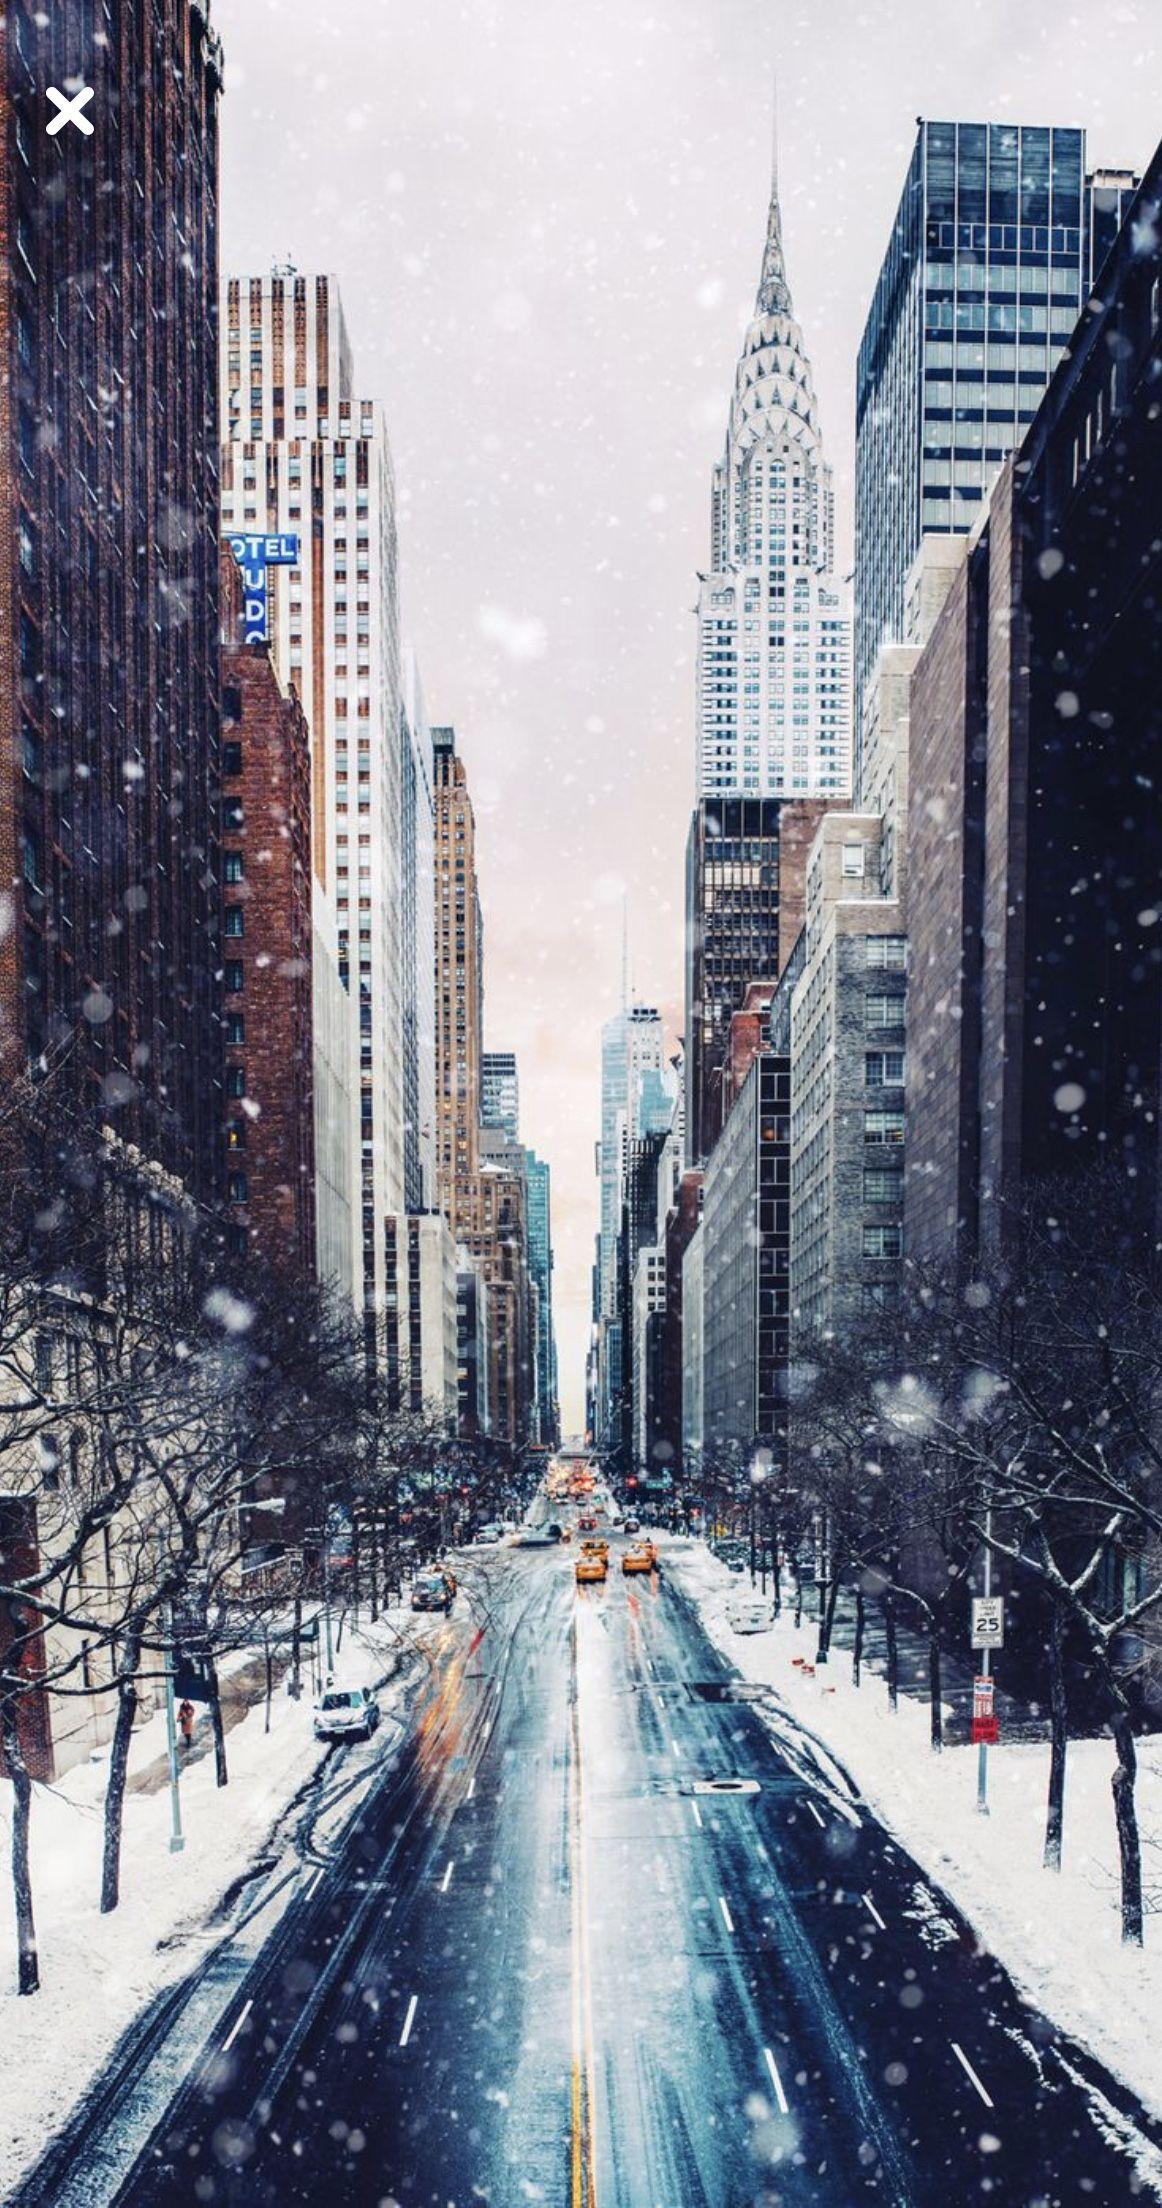 Nyc Winter Iphone Wallpaper